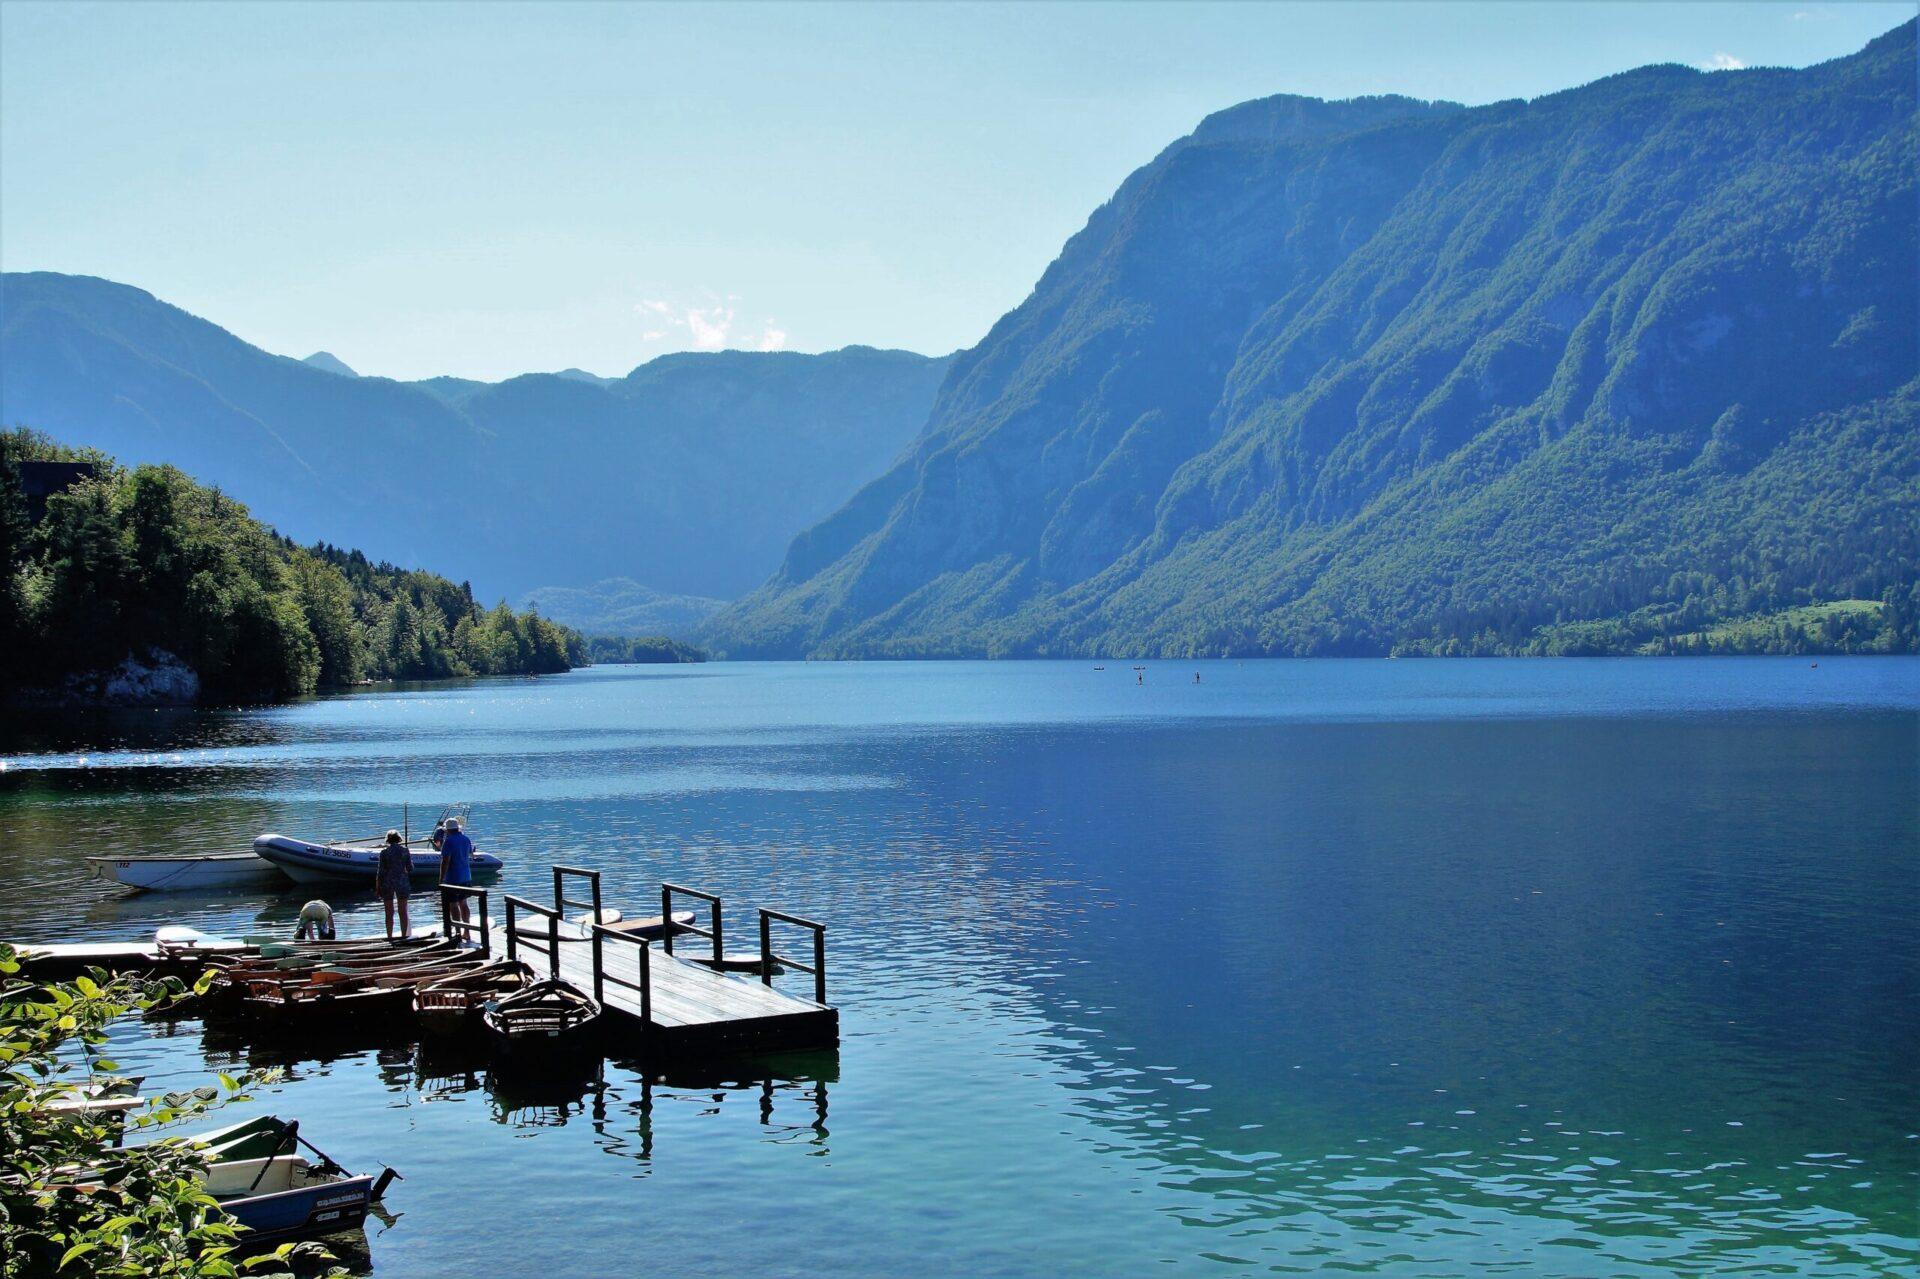 lake bohinj, bohinj, water sports